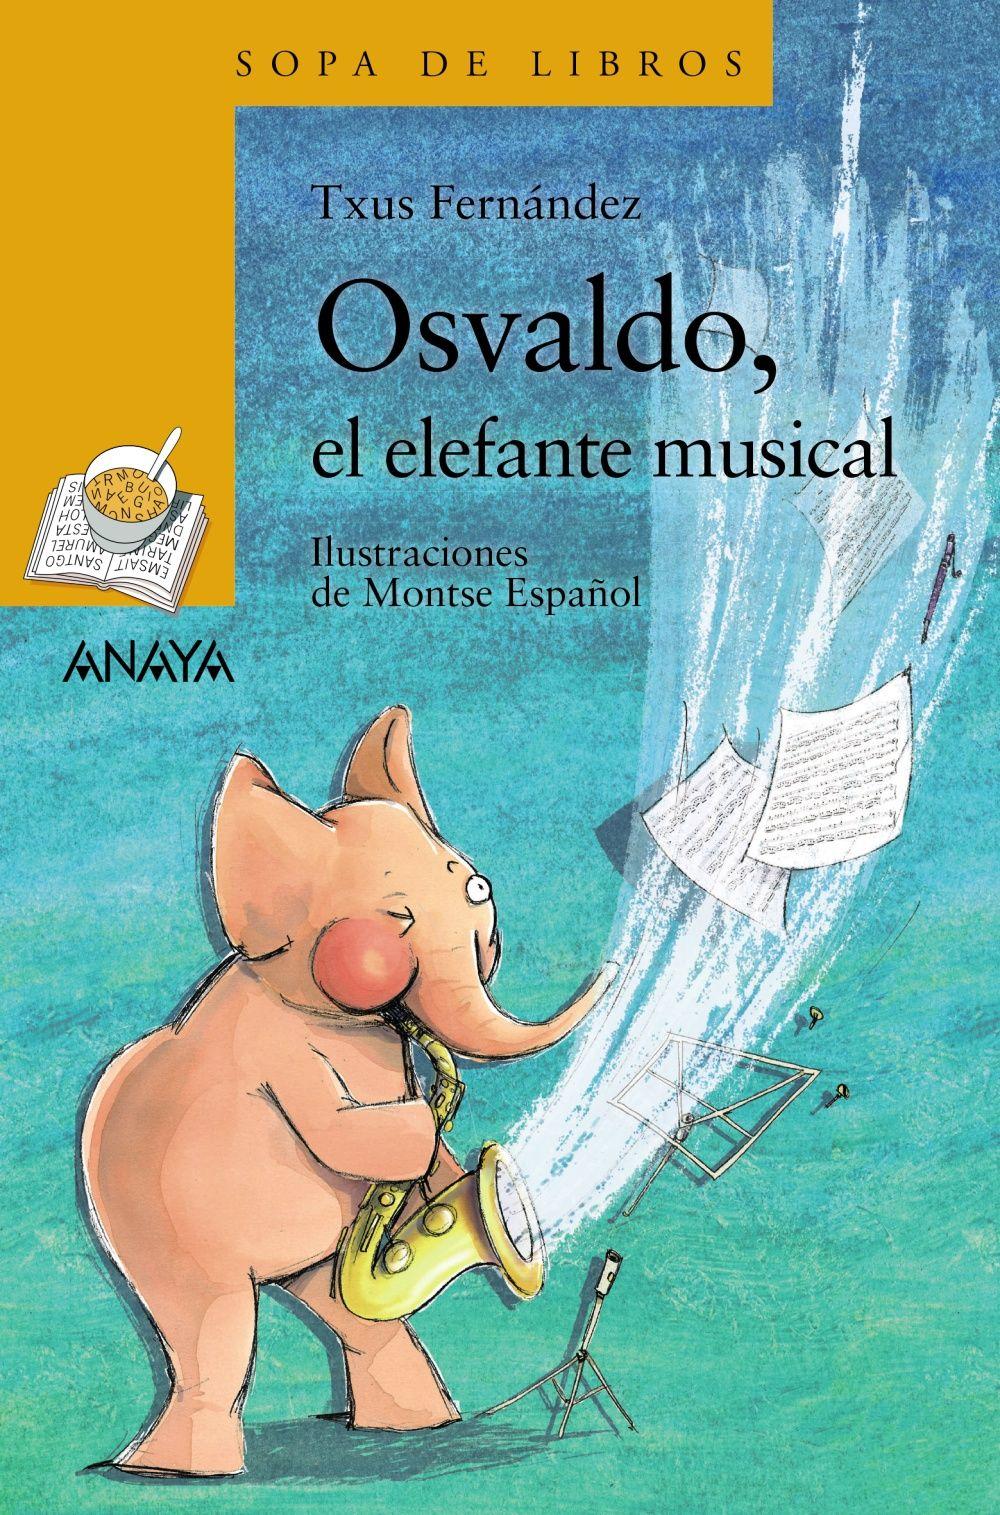 OSVALDO EL ELEFANTE MUSICAL